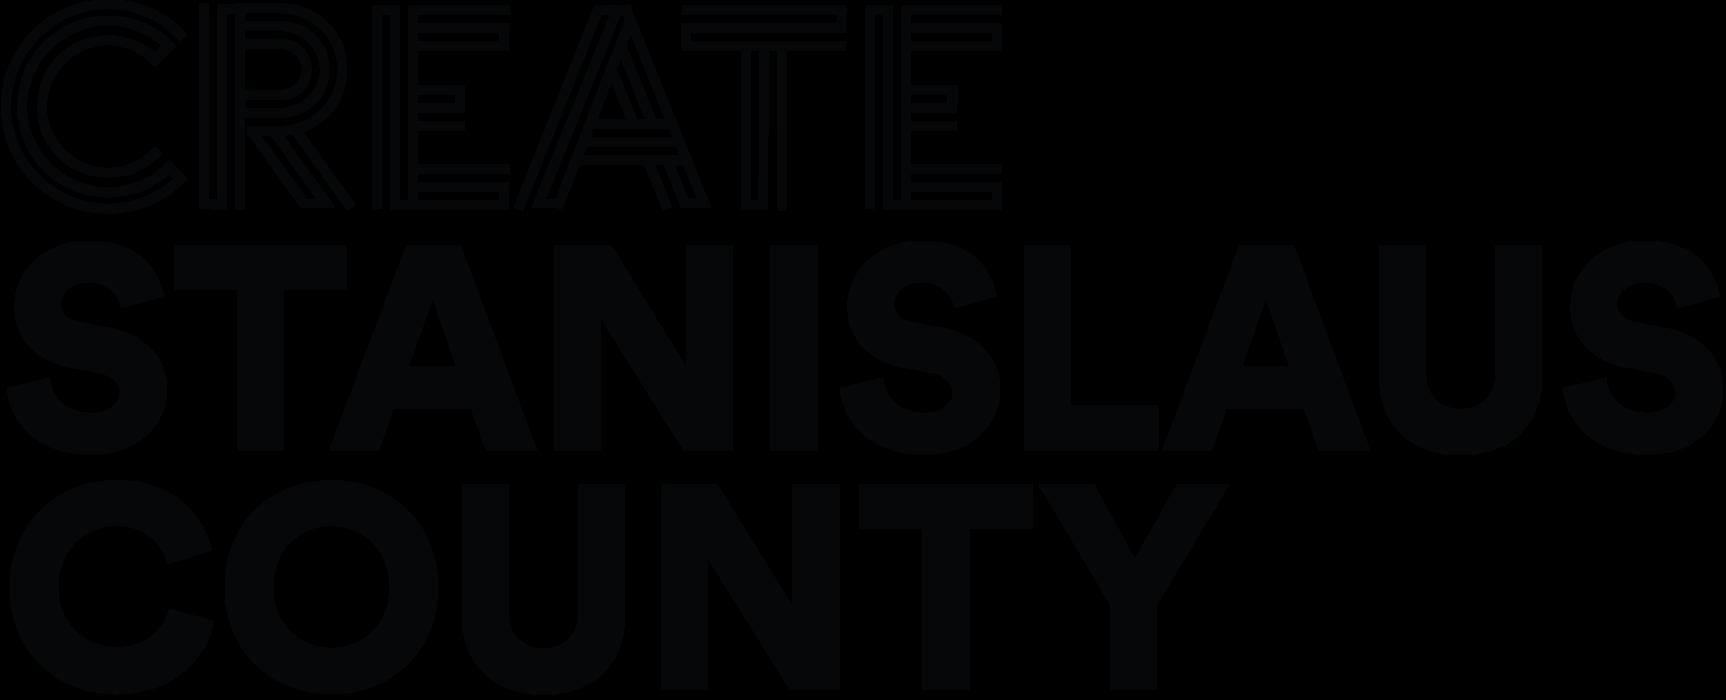 https://createca.org/wp-content/uploads/2020/01/Create-Ca-County-Logos-47-e1580495519183.png